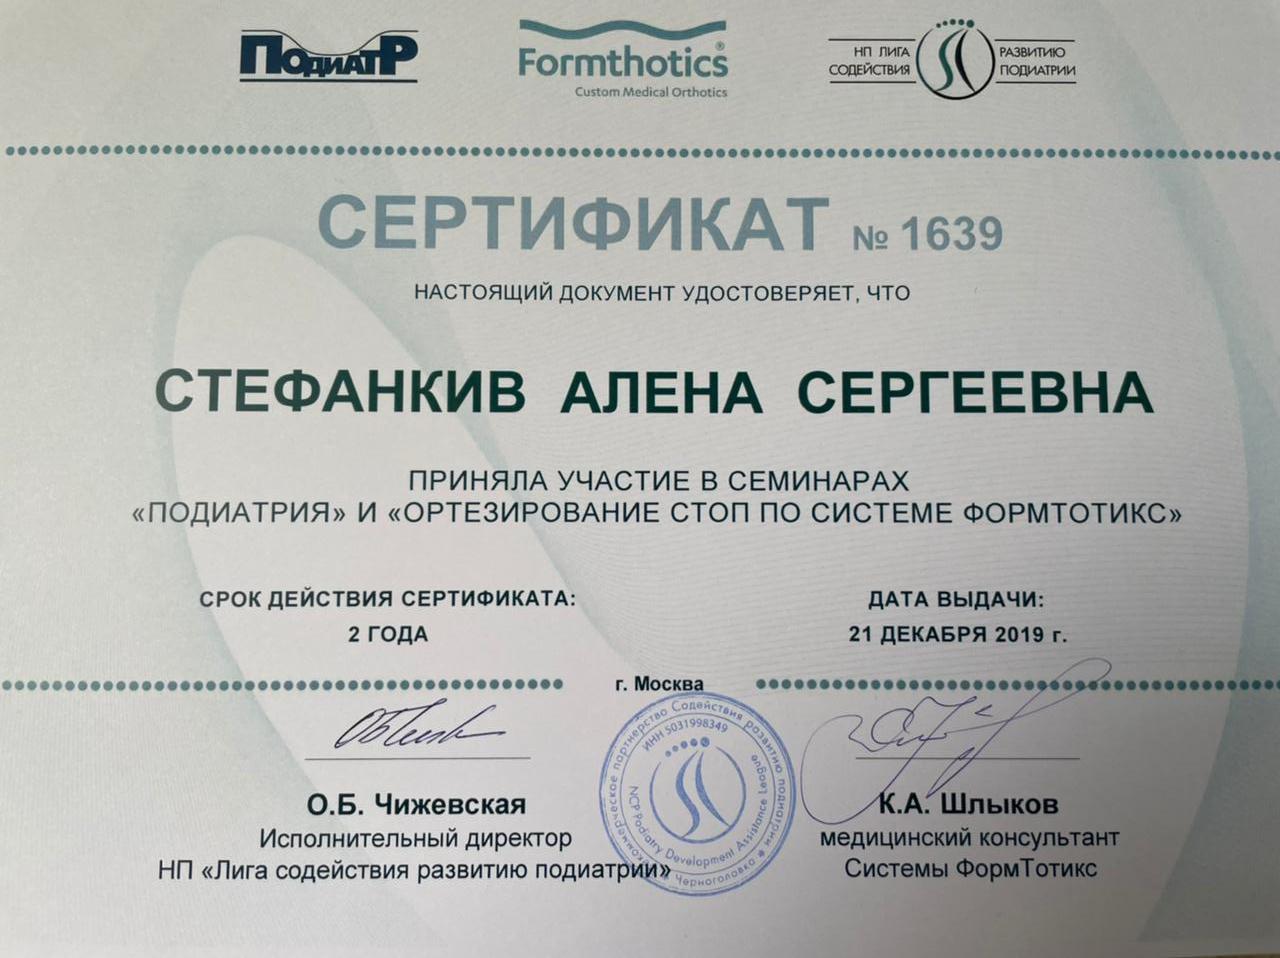 IMG_20210818_164645